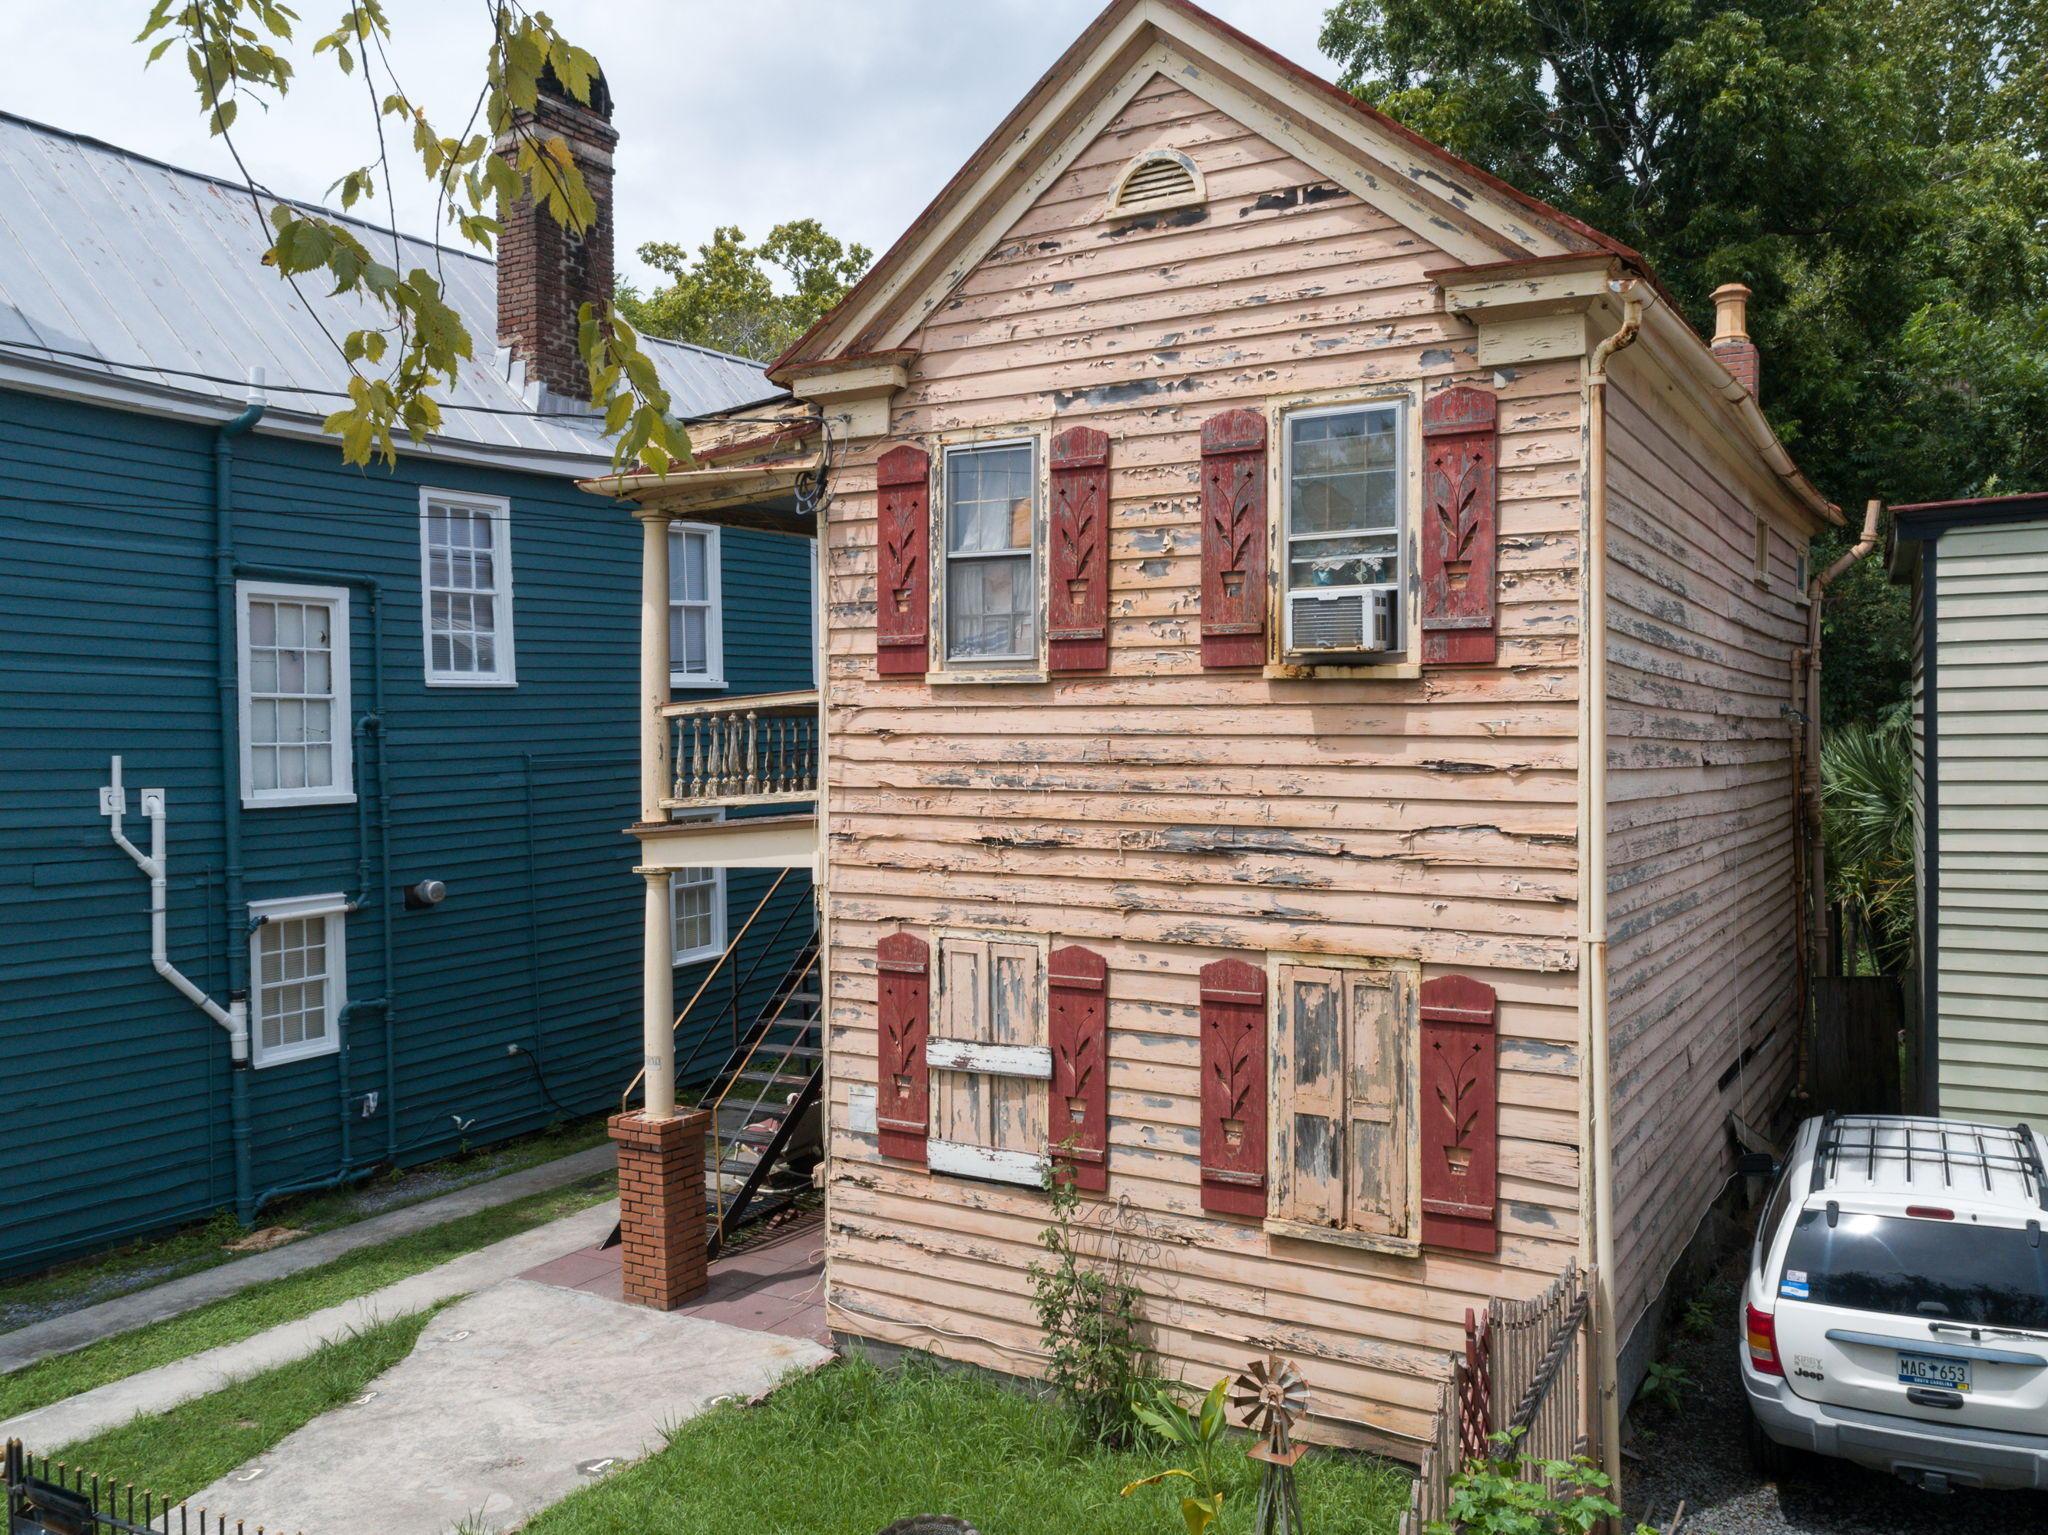 Radcliffeborough Homes For Sale - 92 Morris, Charleston, SC - 6